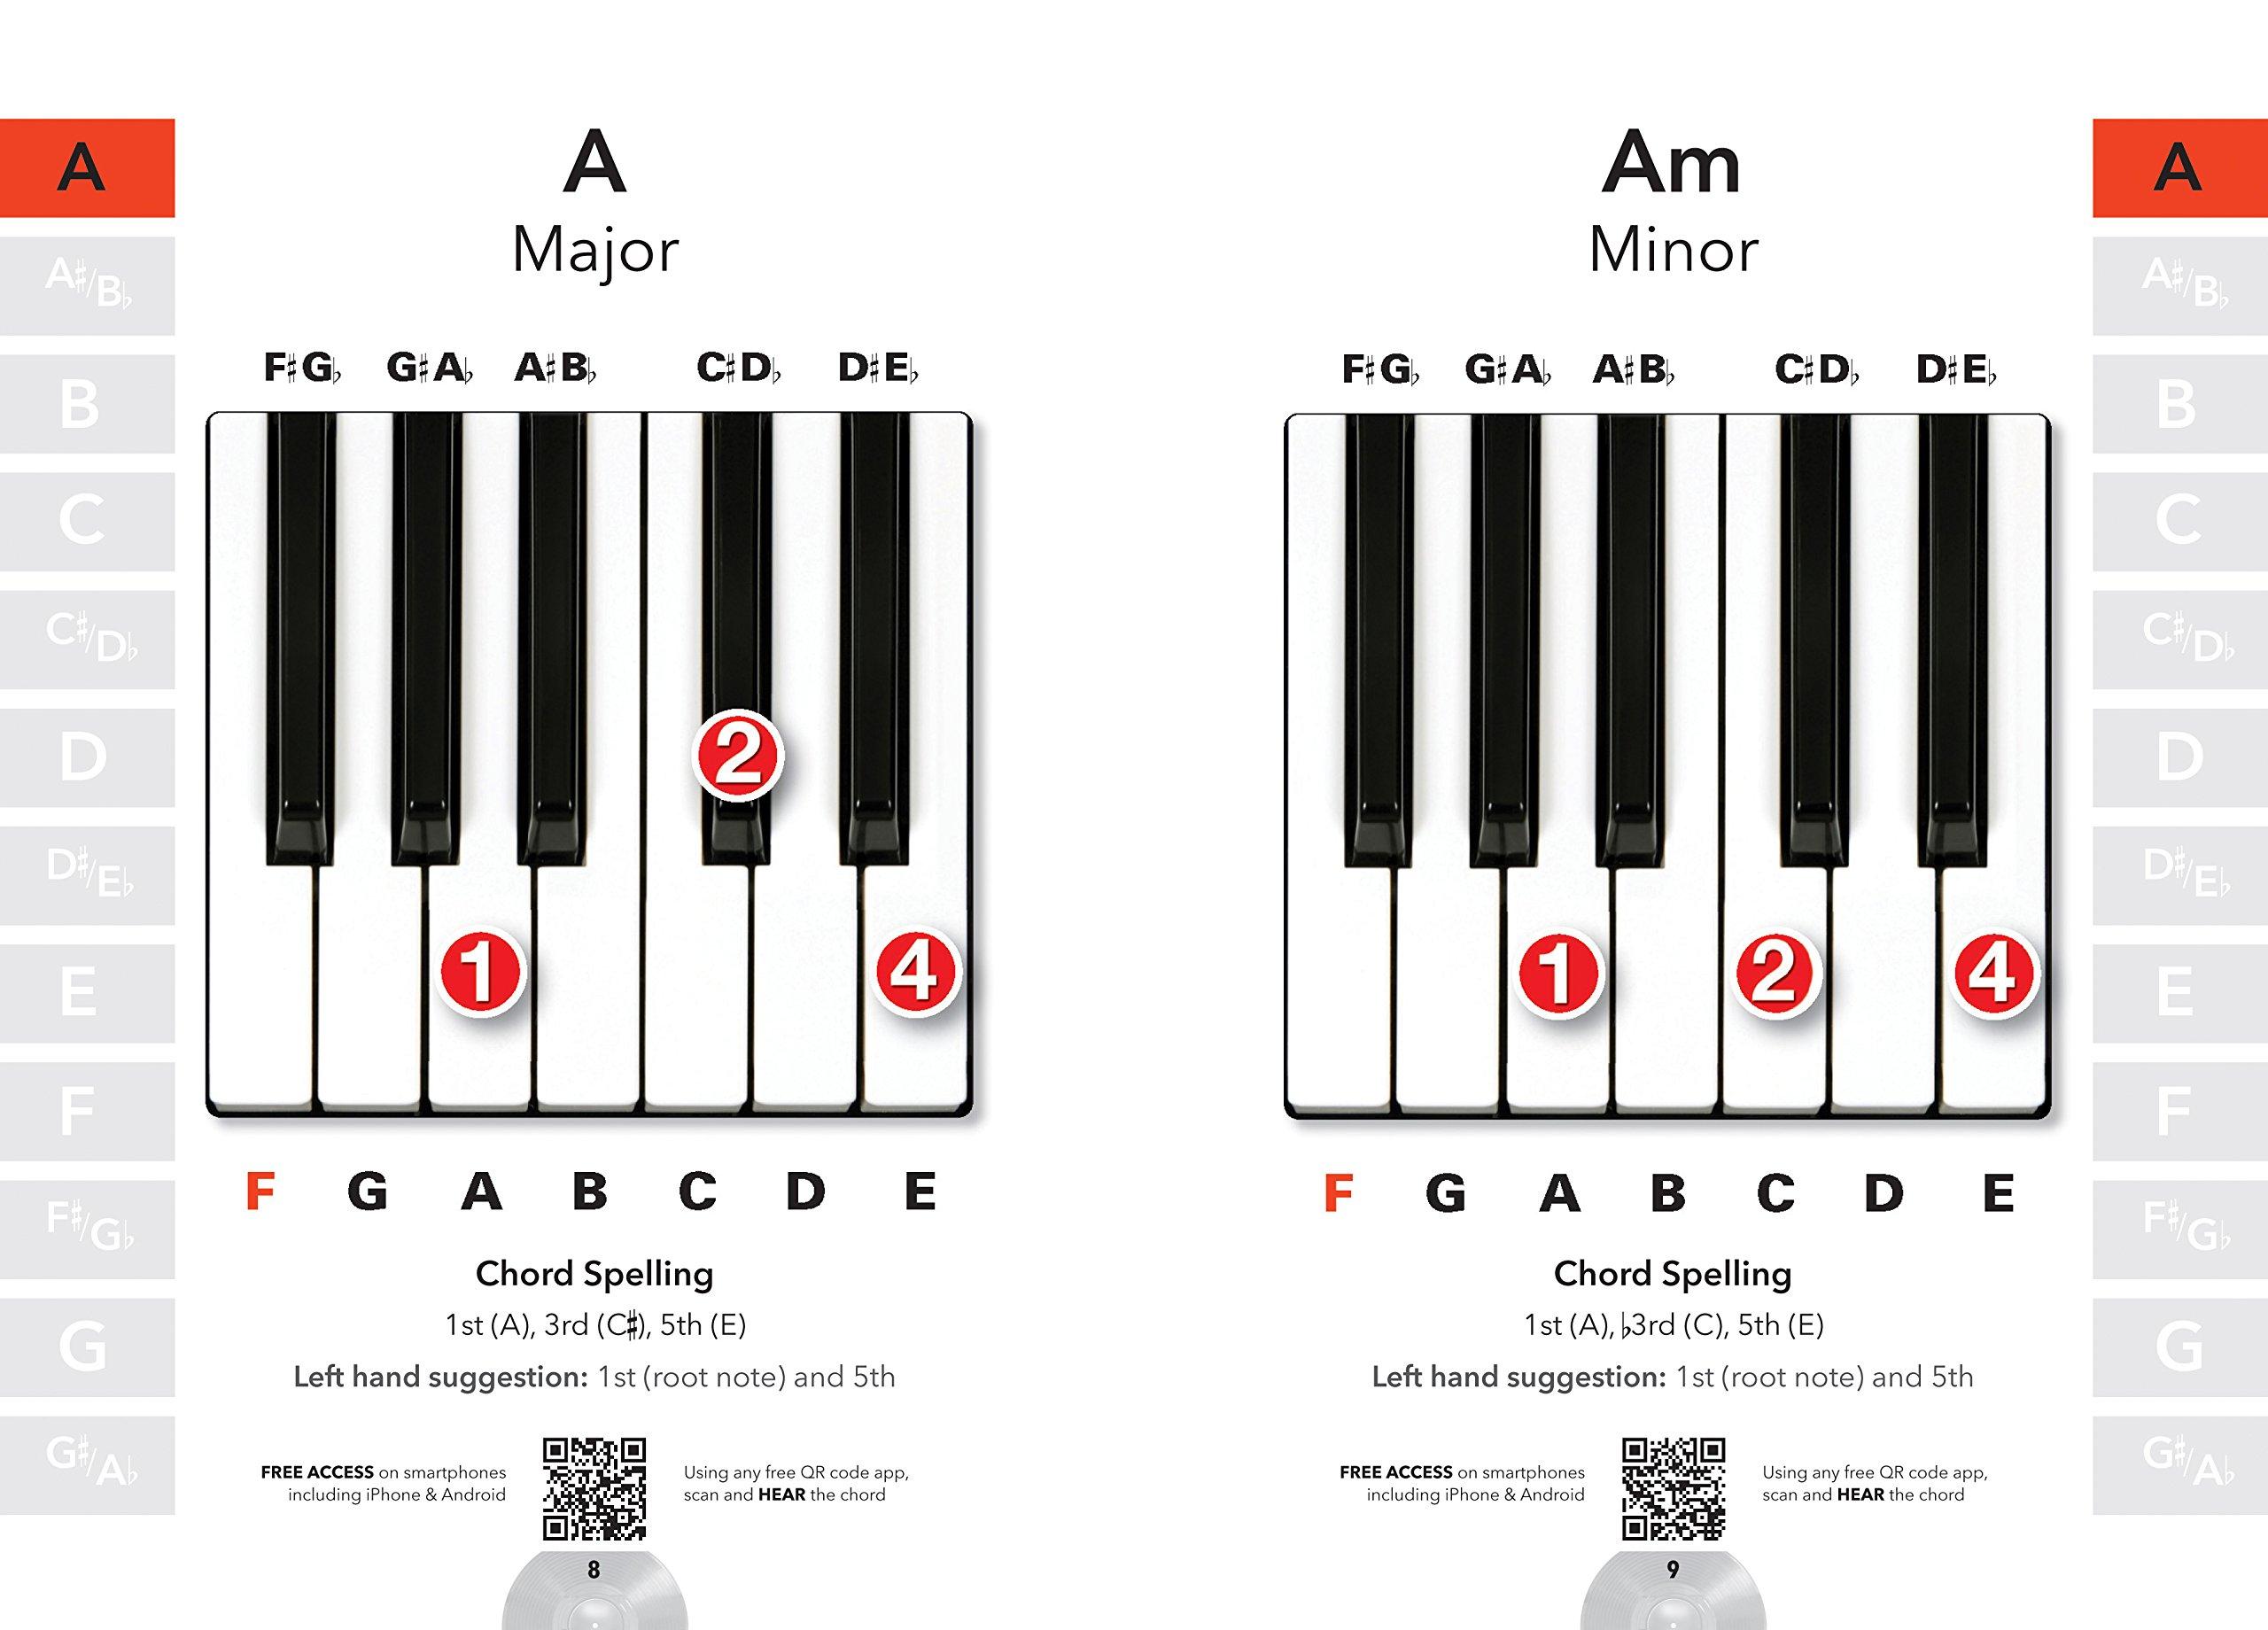 Piano chords pick up play jake jackson 9781783619214 amazon piano chords pick up play jake jackson 9781783619214 amazon books hexwebz Image collections